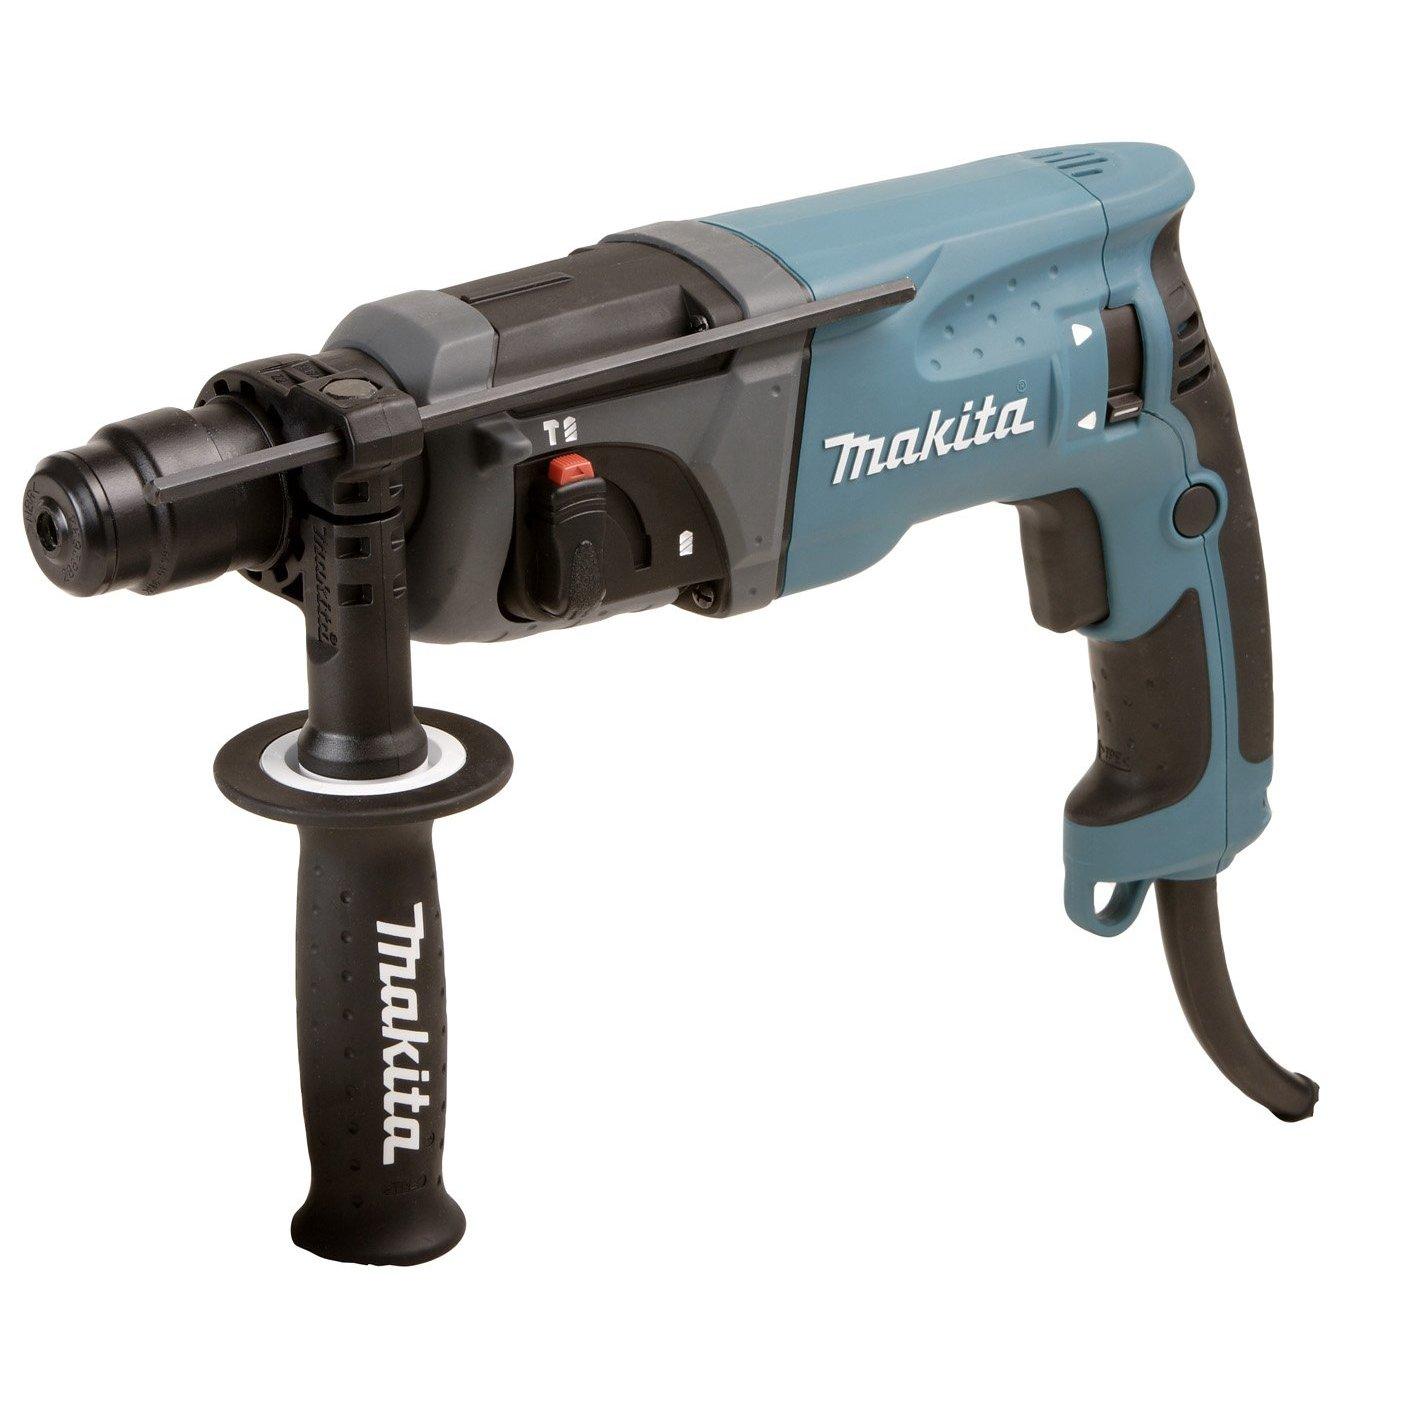 Makita-HR-2460-SDS-Plus-Bohrhammer